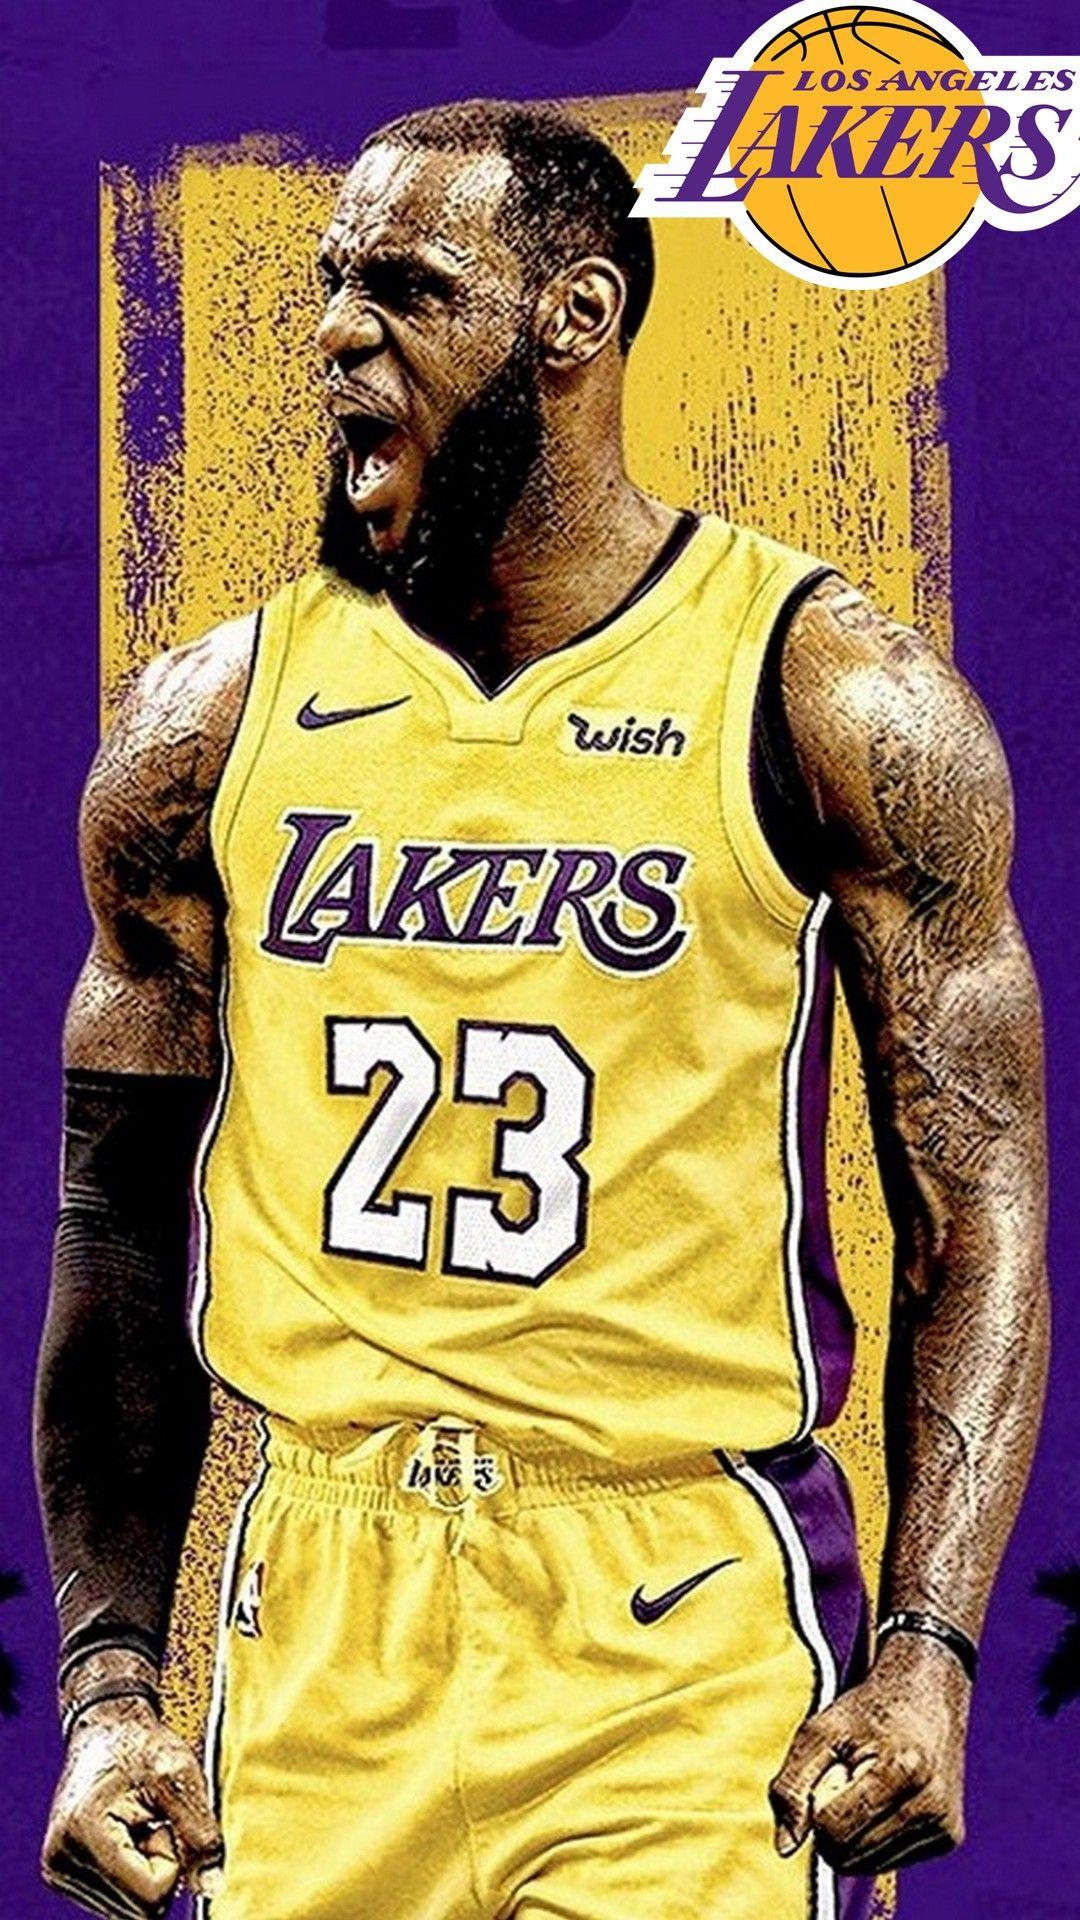 Basketball Wallpaper Best Basketball Wallpapers 2020 Lebron James Lakers Lebron James Poster Lebron James Wallpapers